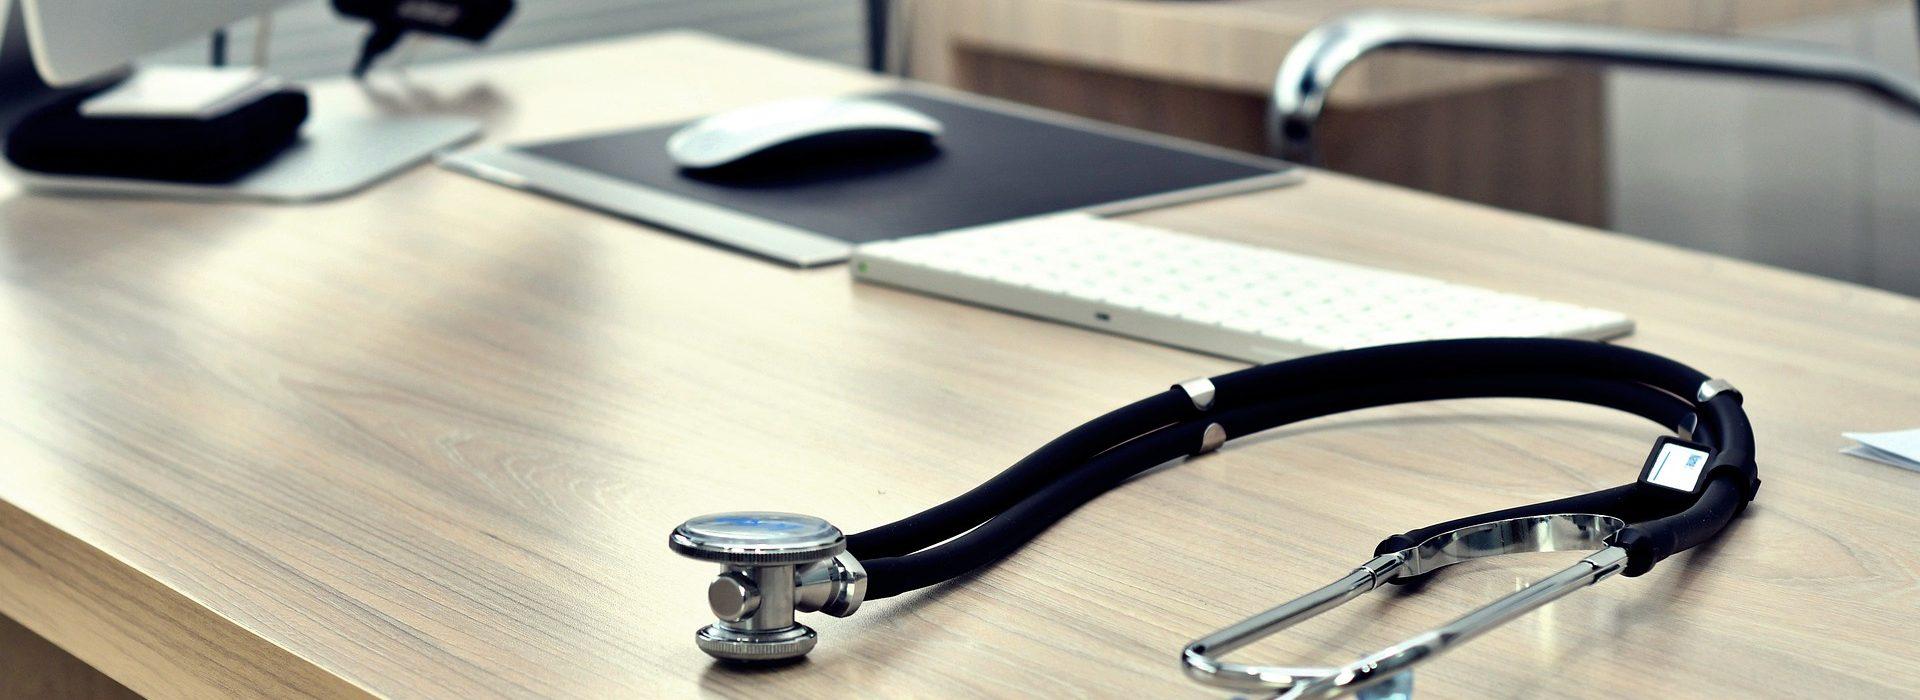 stethoscope-5224534_1920